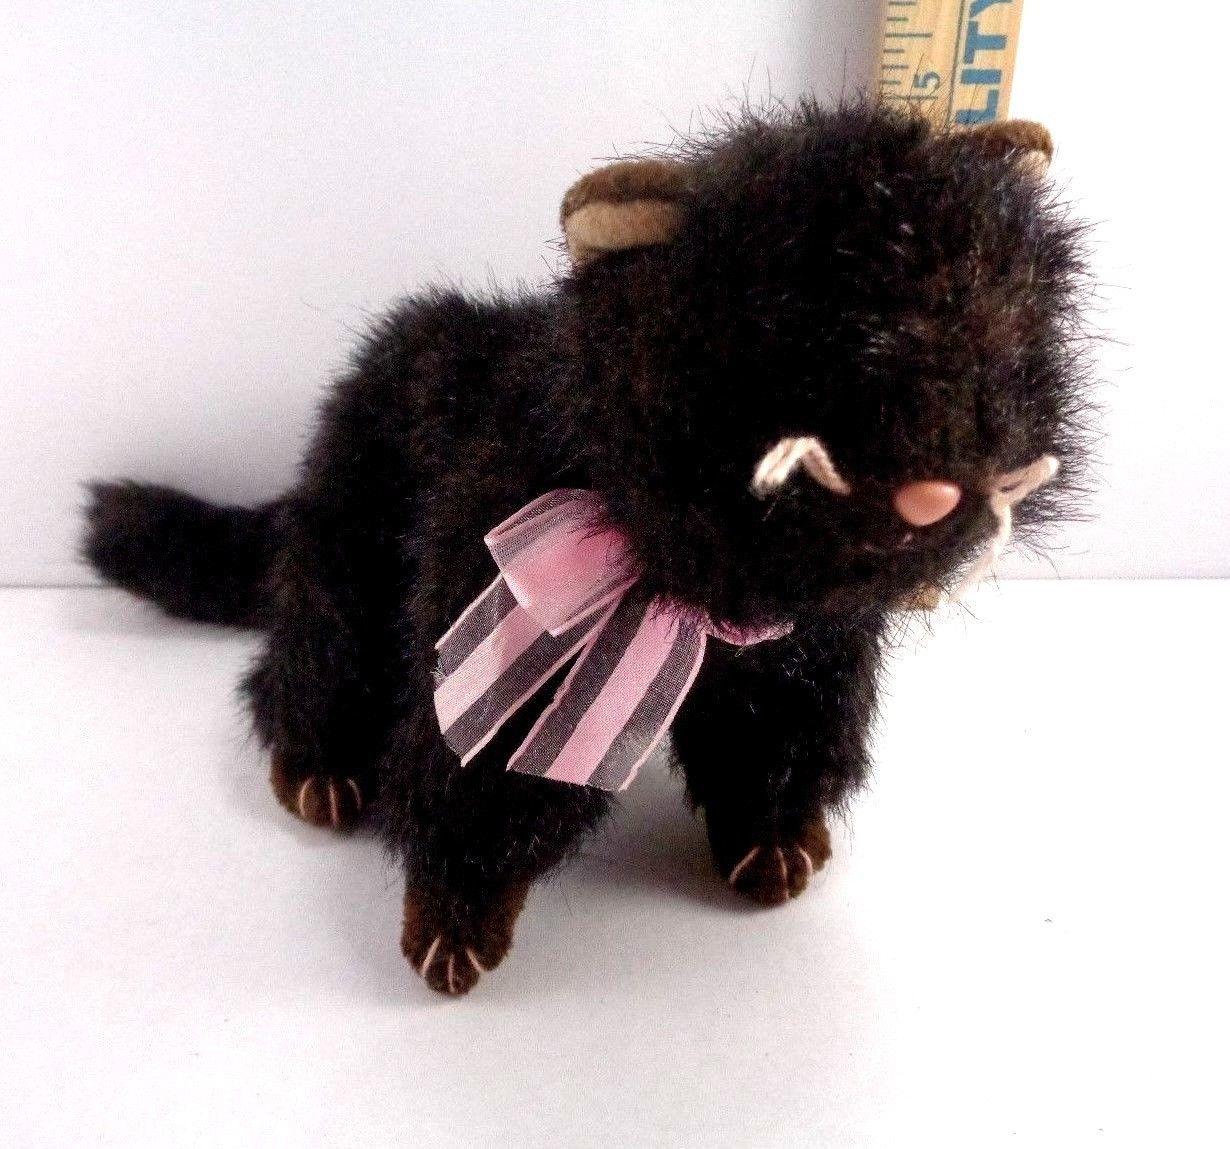 Halloween Ty Black Cat Heiress Pink Bow Plush Stuffed Animal Toy Doll